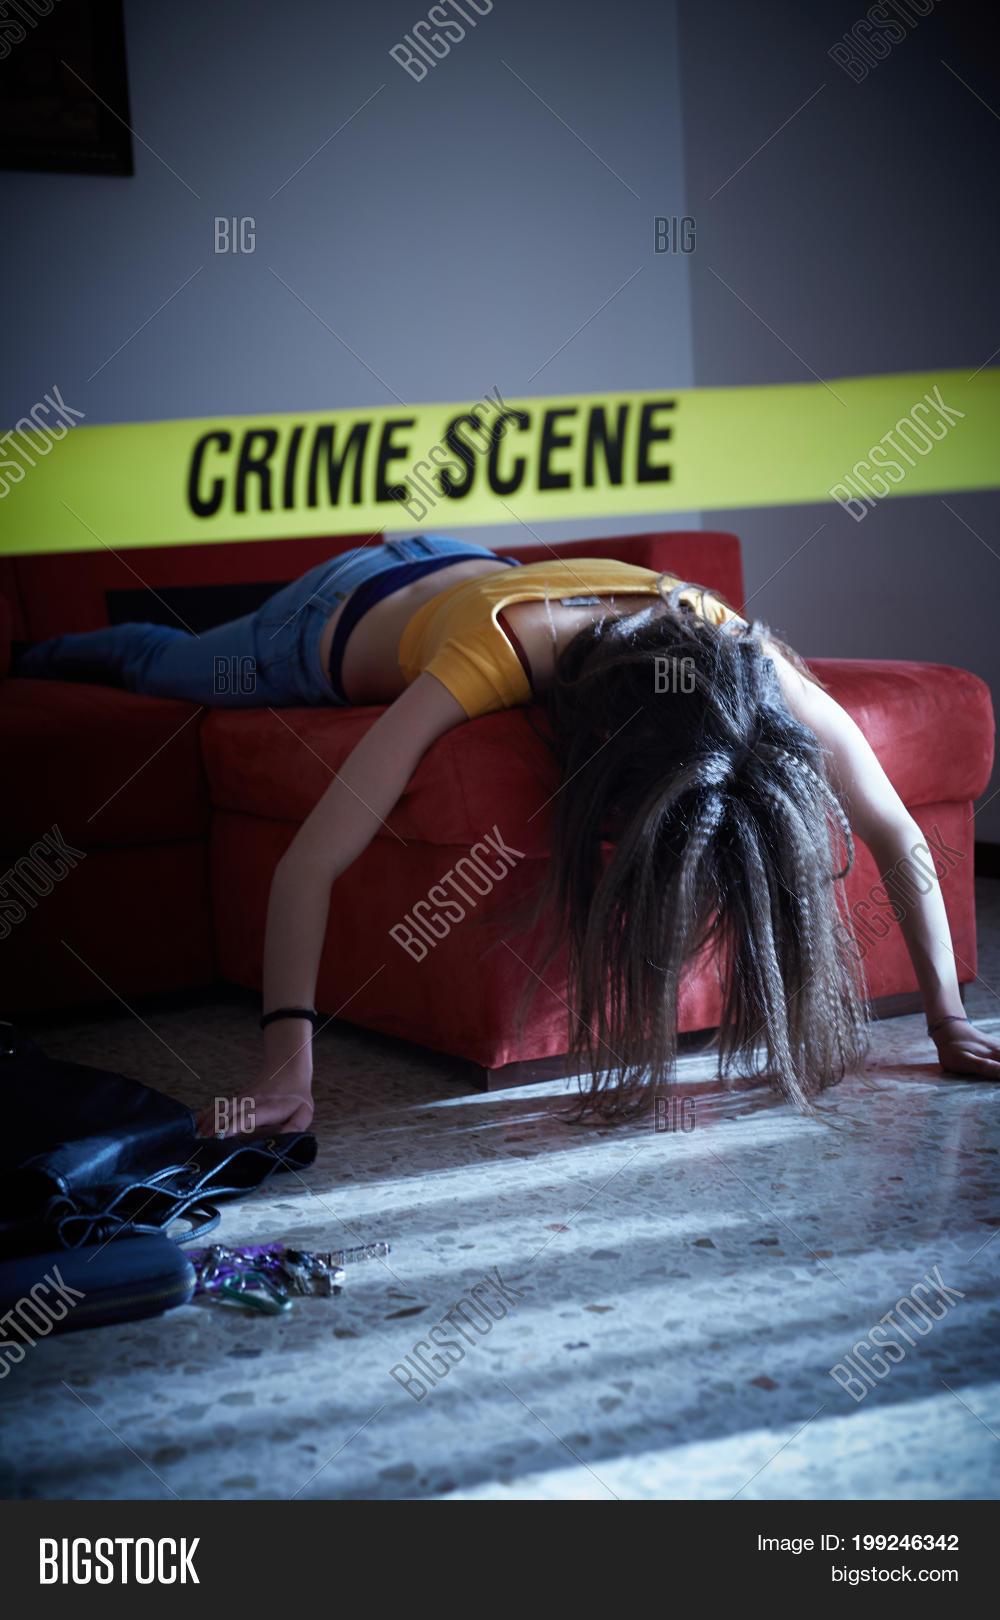 Crime Scene Simulation Image & Photo (Free Trial) | Bigstock